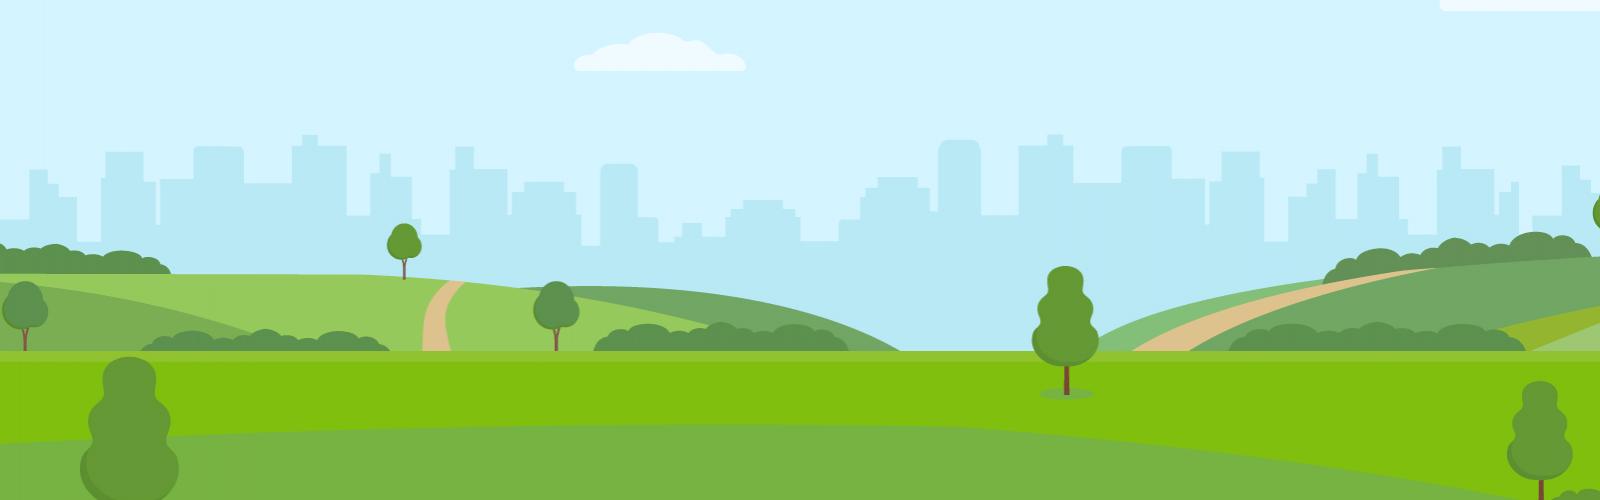 a city landscape